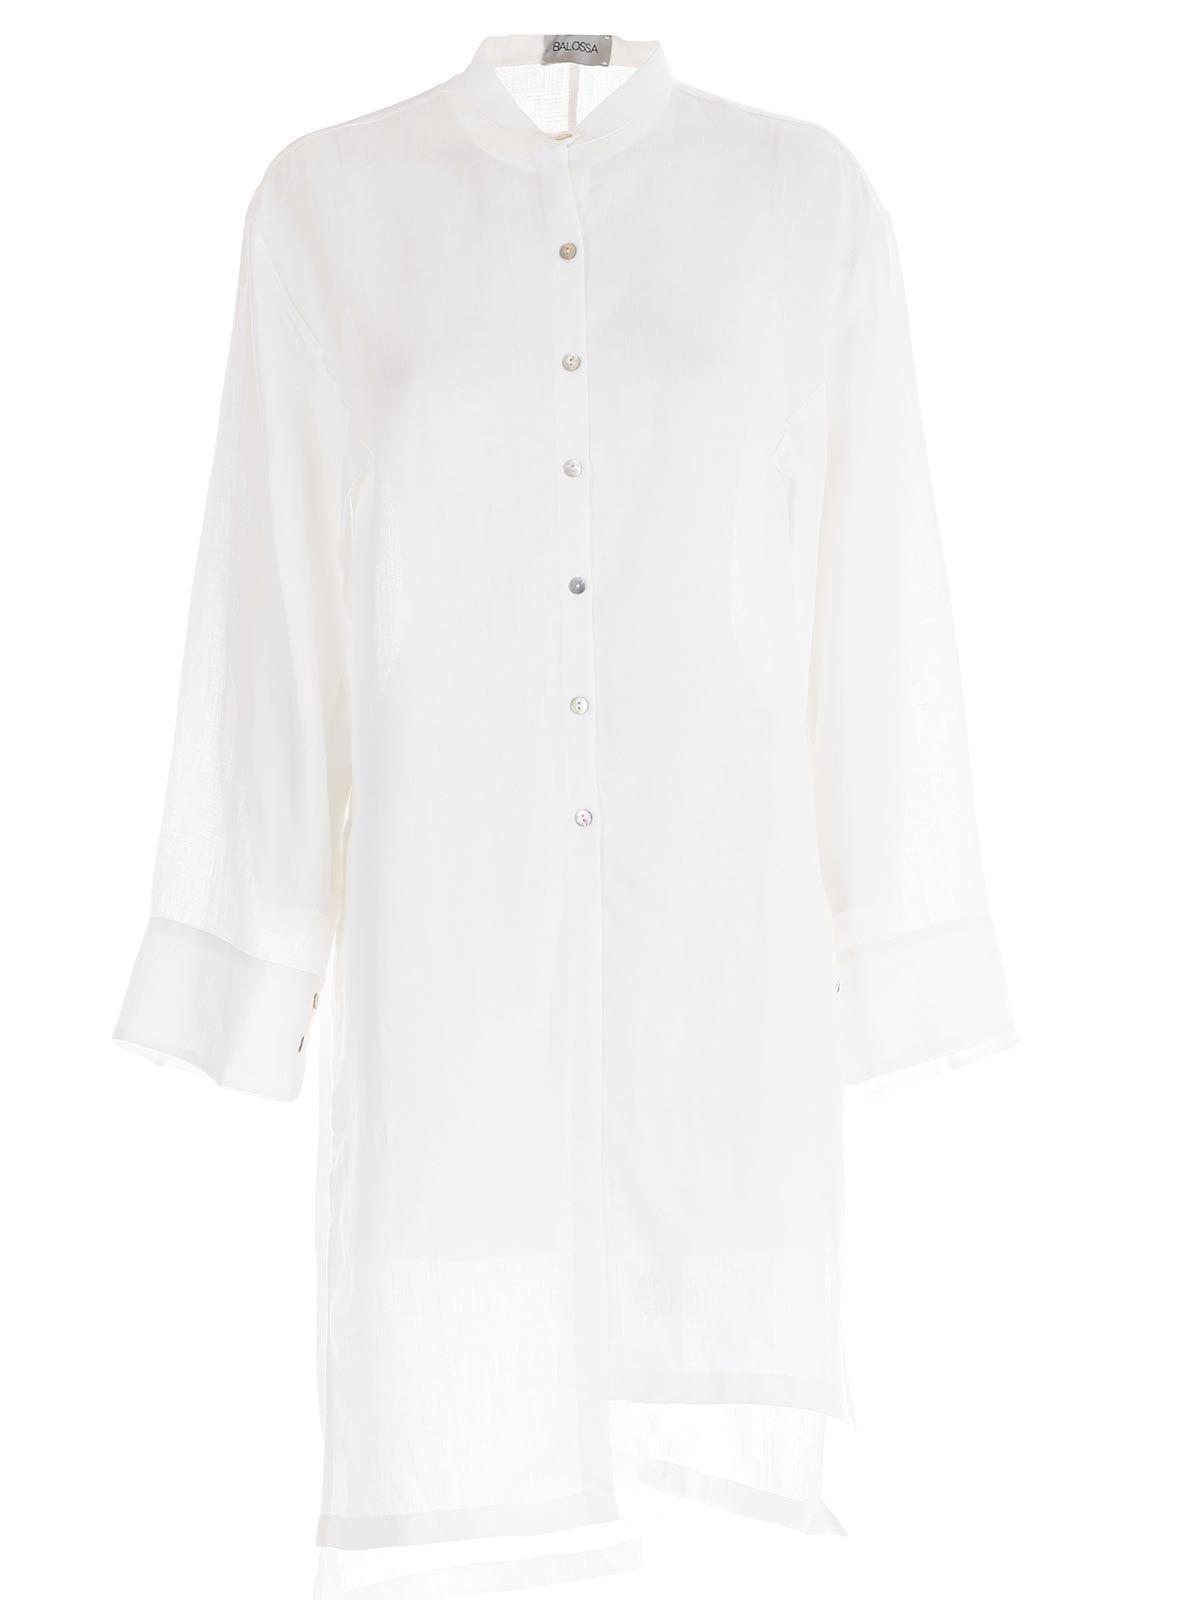 Balossa Shirt